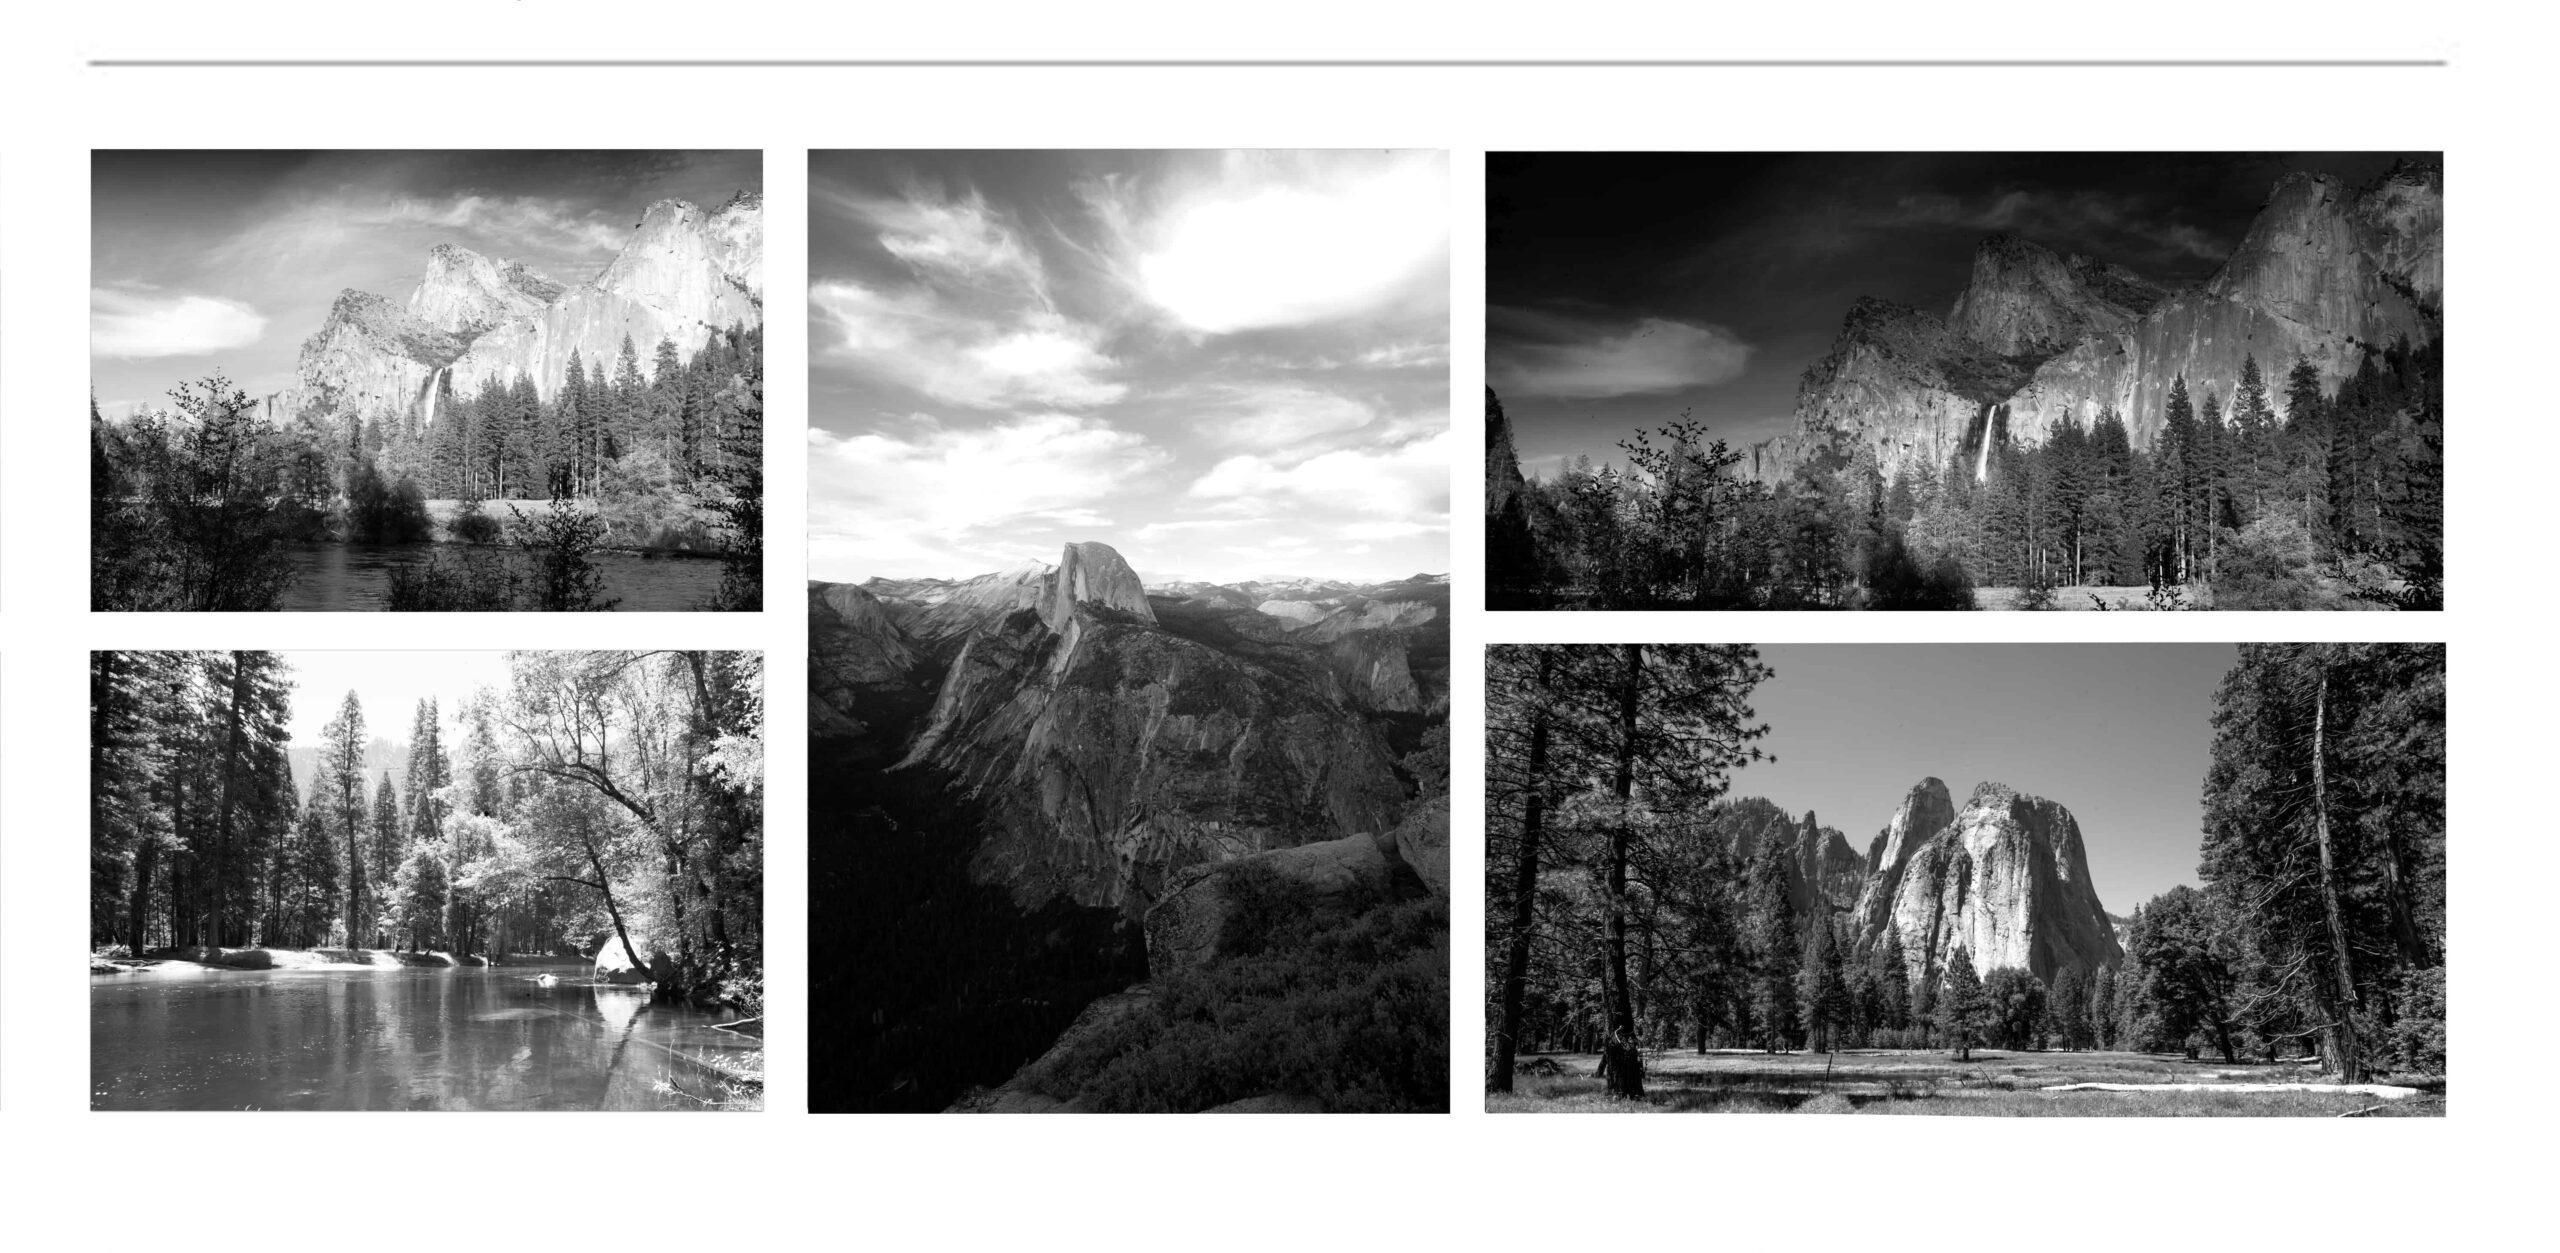 LANDSCAPE Yosemite BLACK AND WHITE FINE ART PHOTOGRAPHY FOR SALE